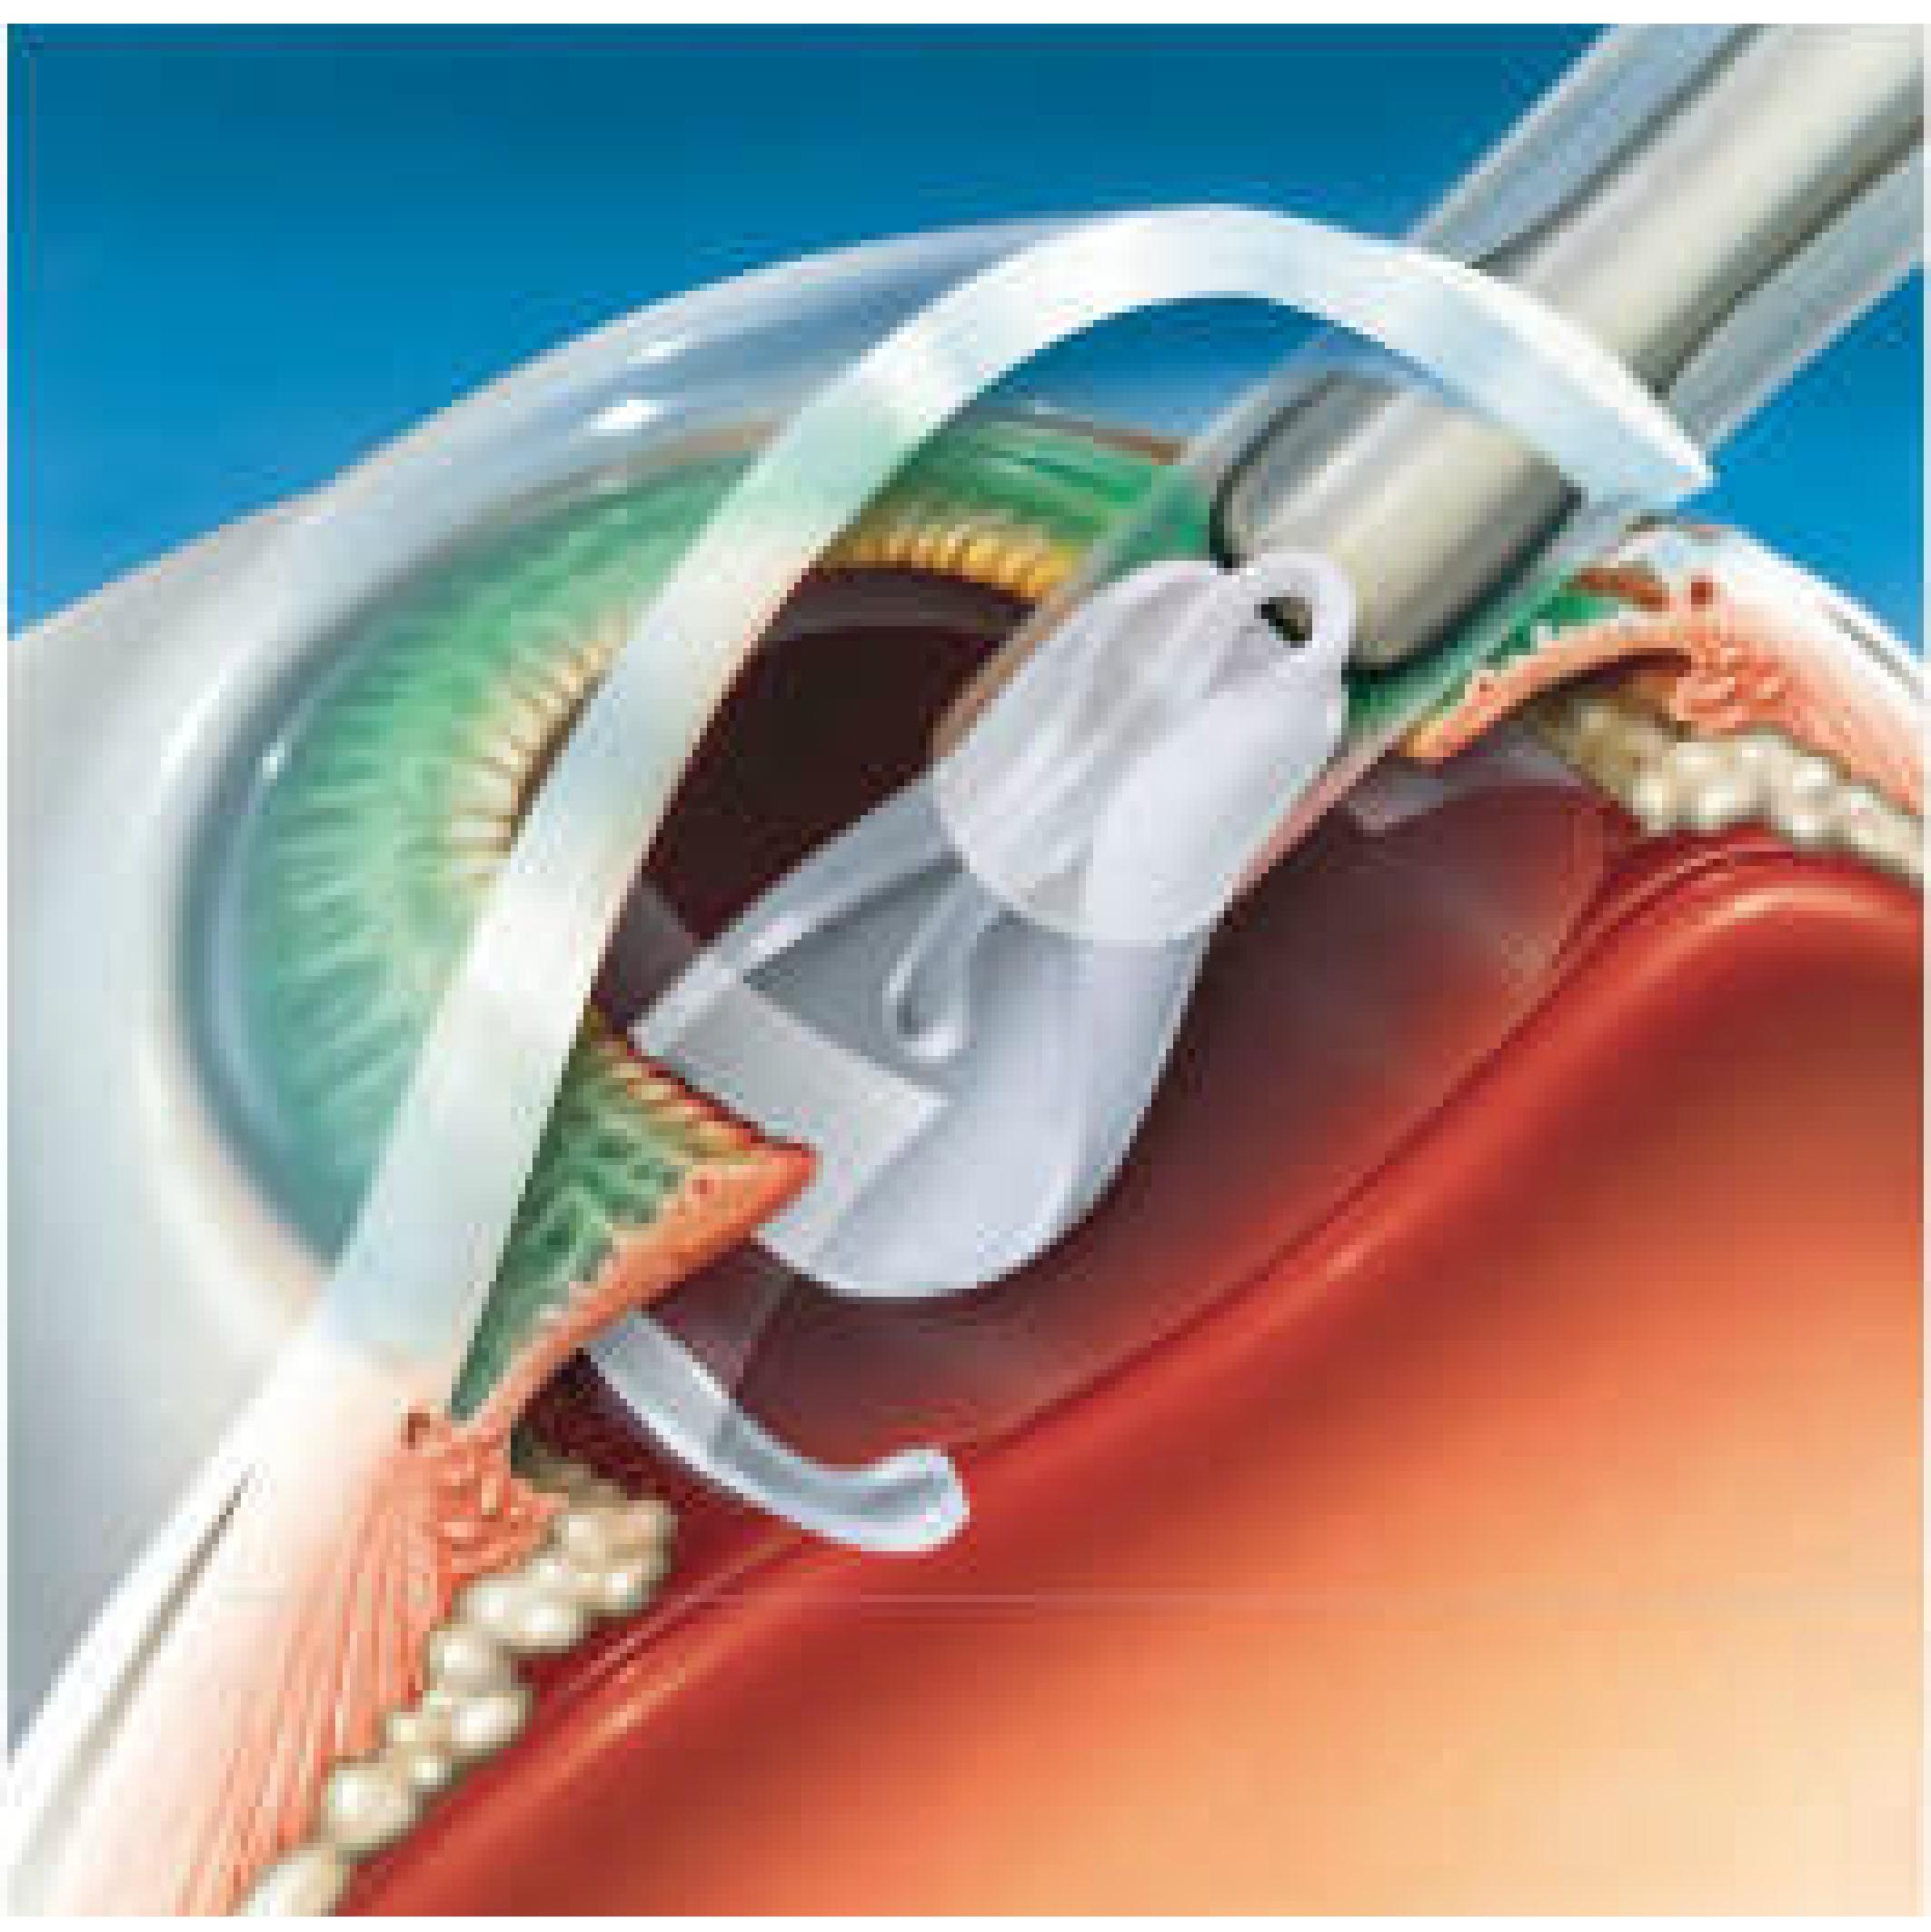 09-Steps-of-surgery1-sm-02